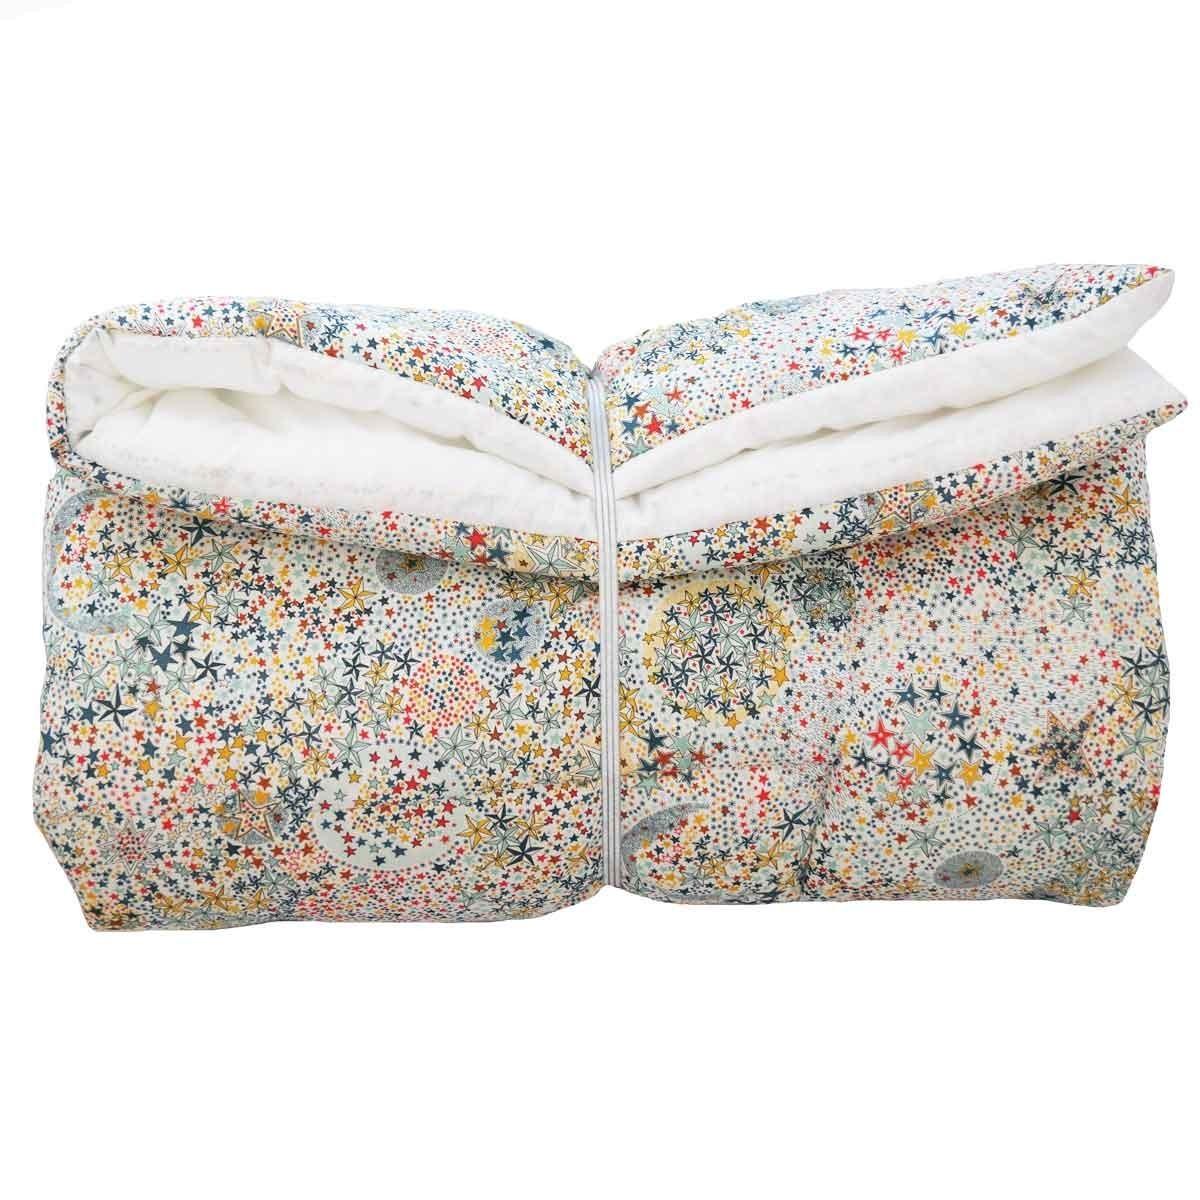 tapis de jeu b b gar on toiles multicolores cadeau de. Black Bedroom Furniture Sets. Home Design Ideas